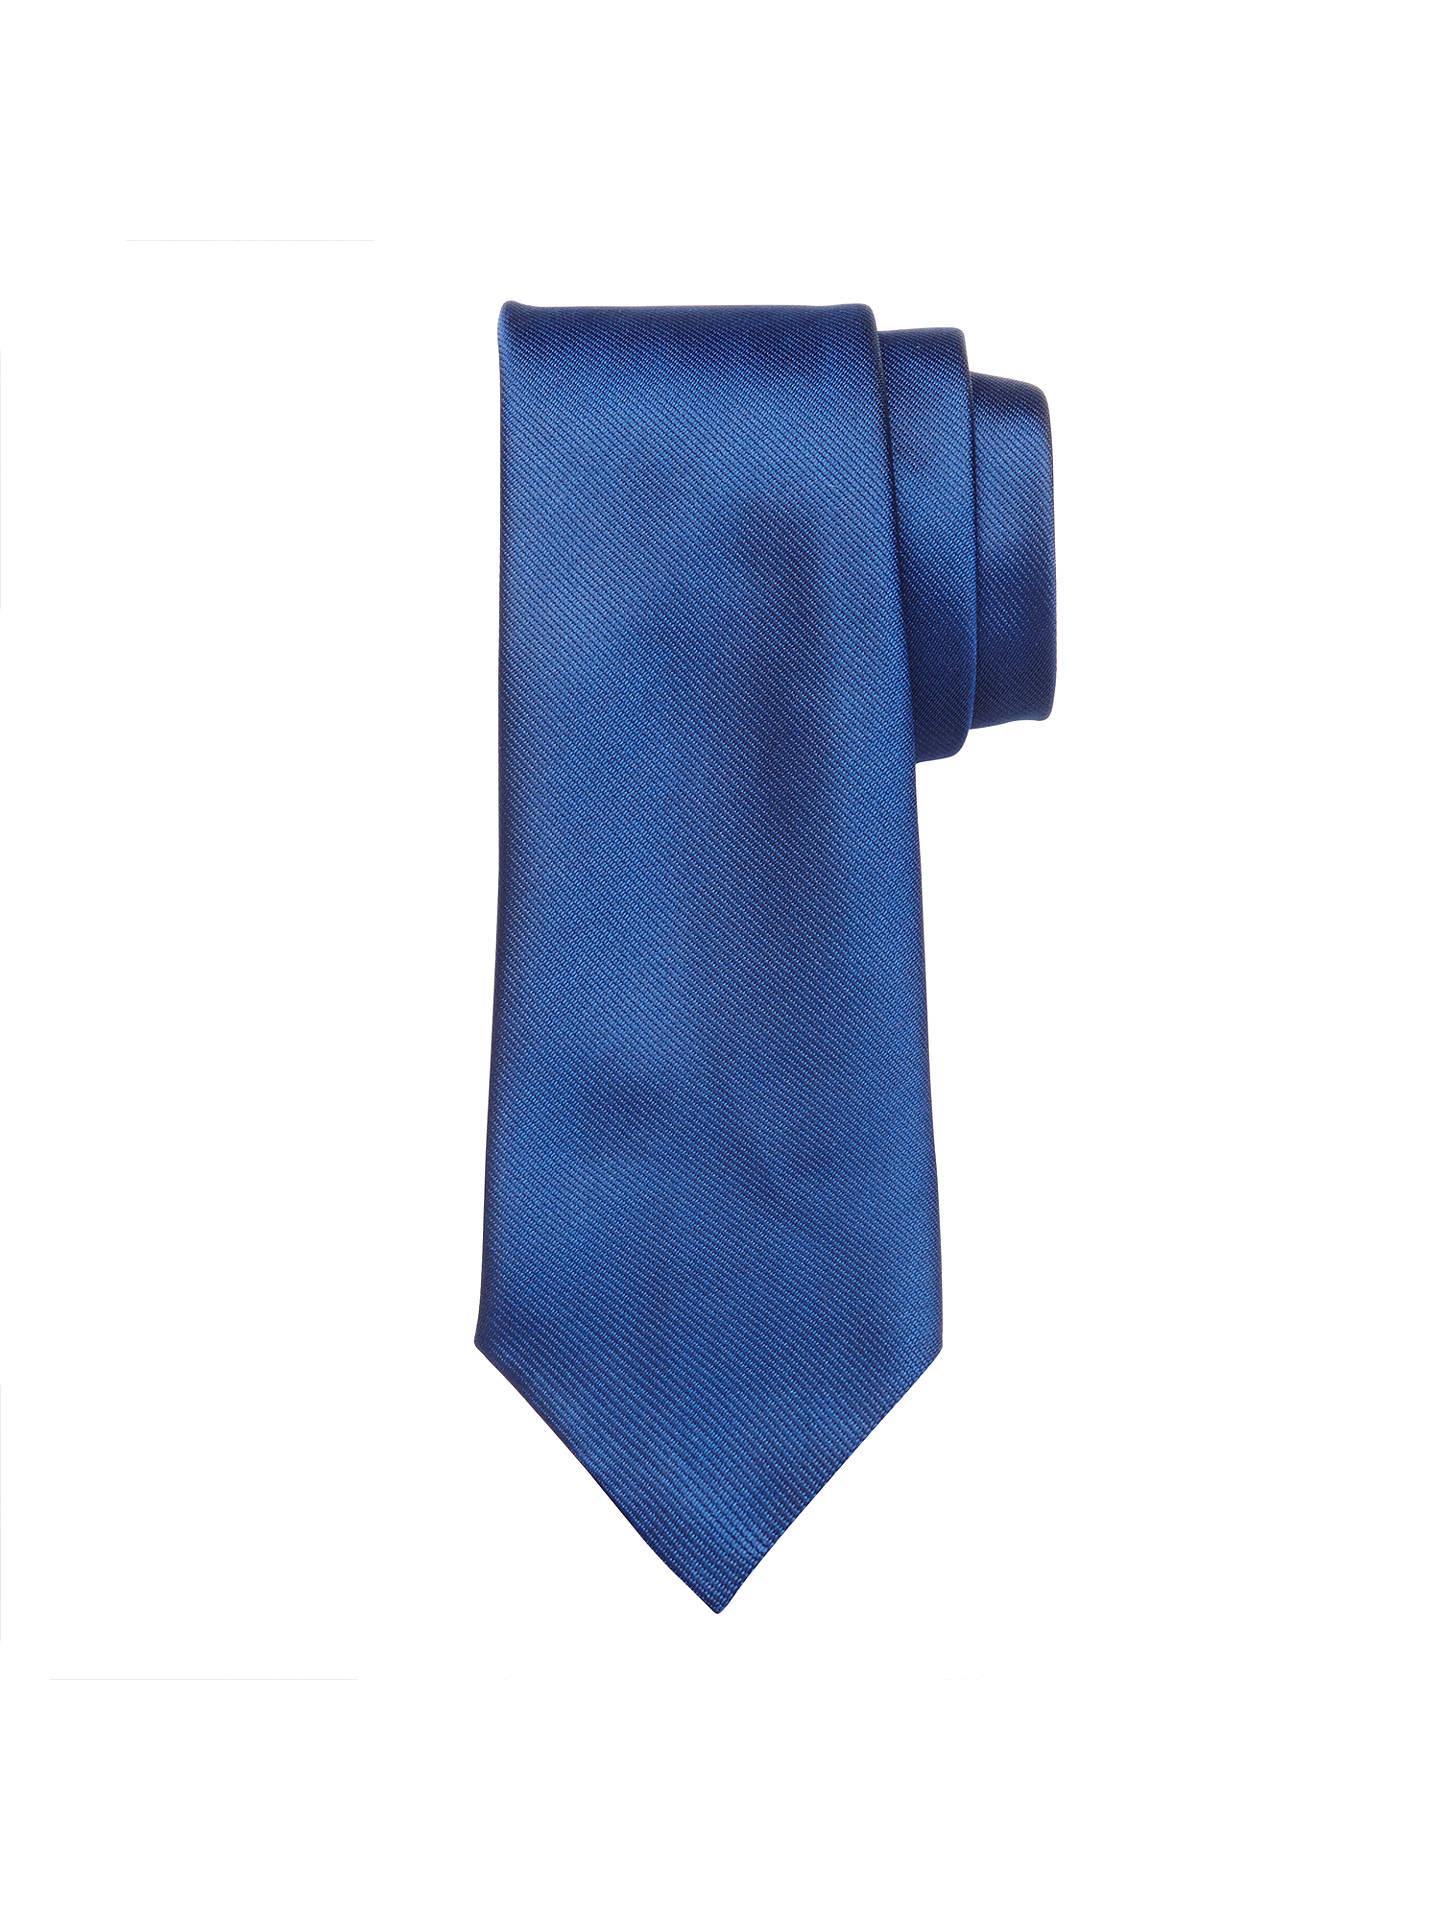 The John Henry Newman Catholic School Year 11 Tie, Blue, 52